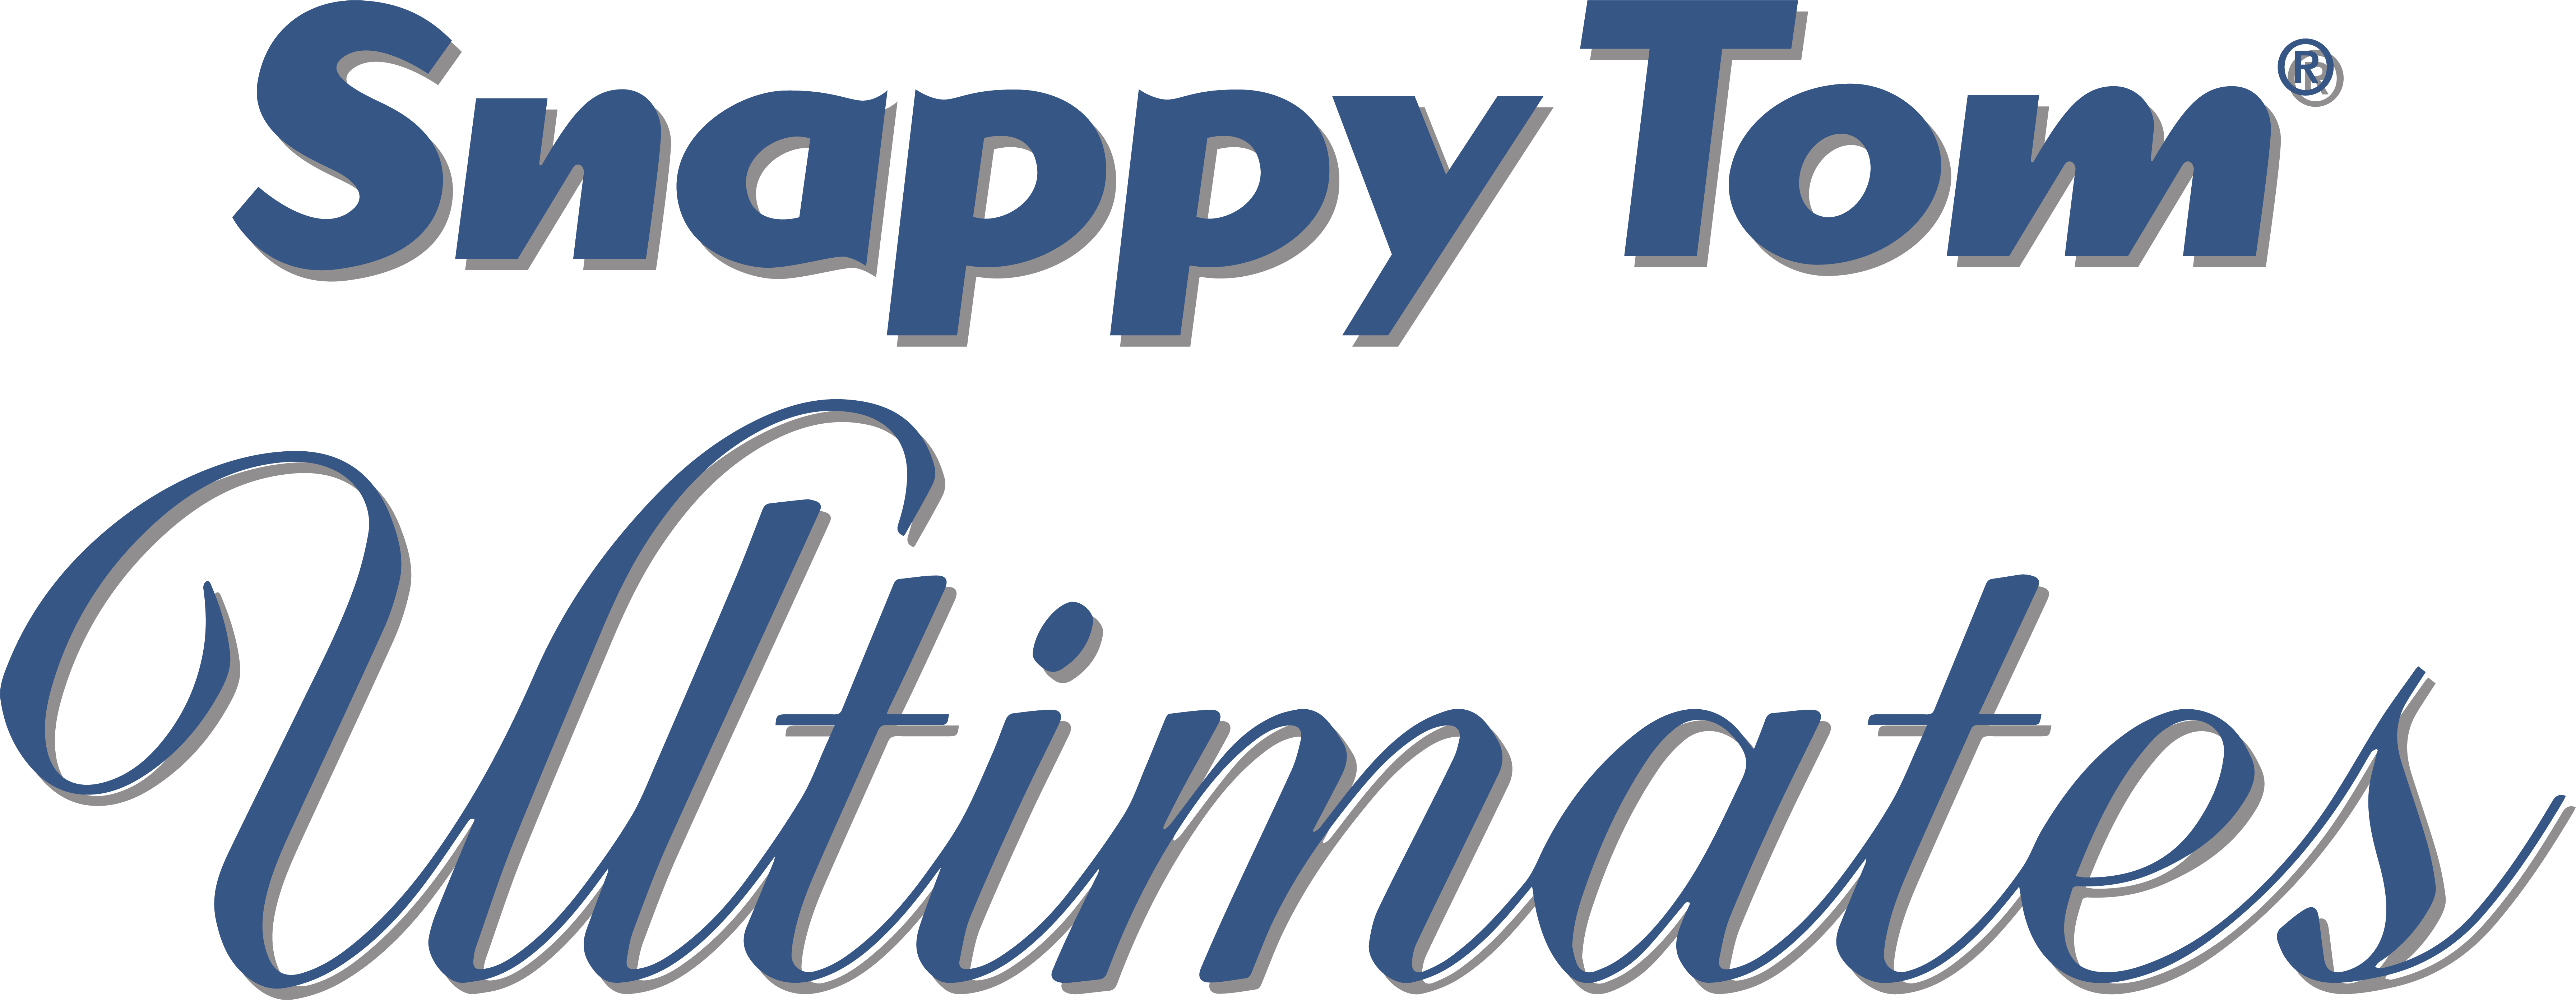 Snappy Tom Ultimates Logo Image